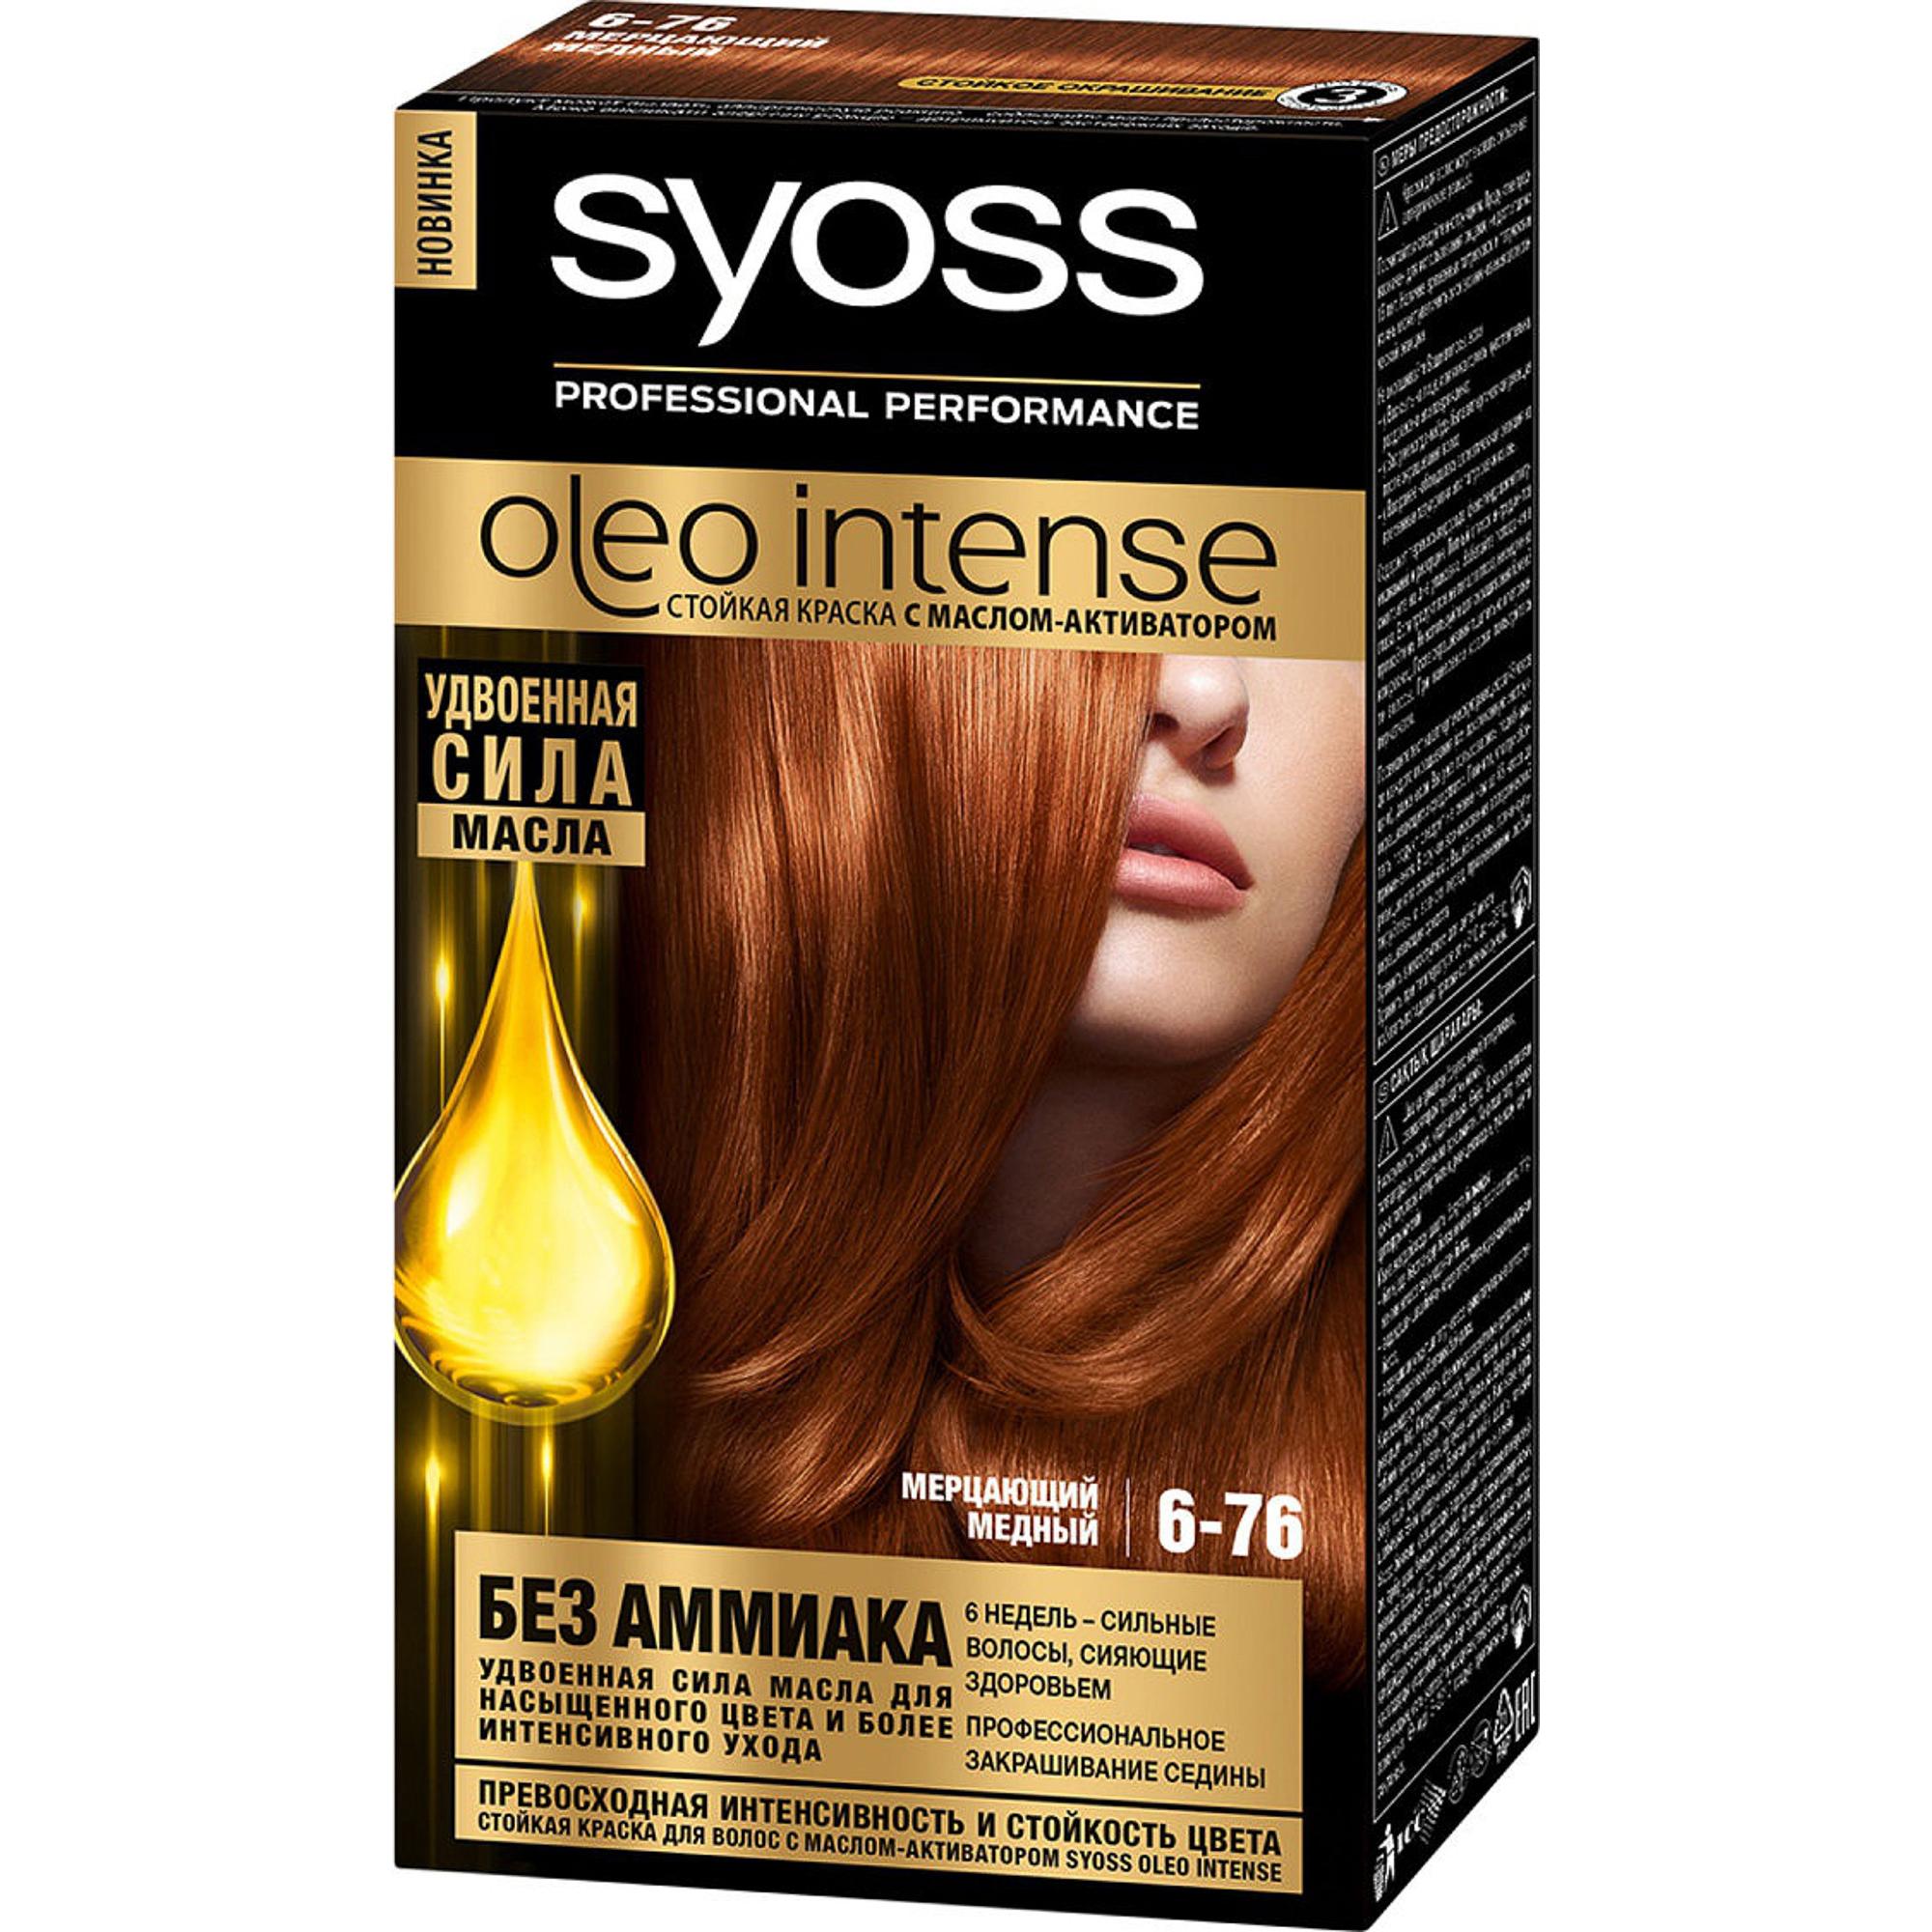 Краска для волос Syoss Oleo Intense 6-76 Мерцающий медный syoss oleo intense краска для волос 6 10 тёмно русый 50мл